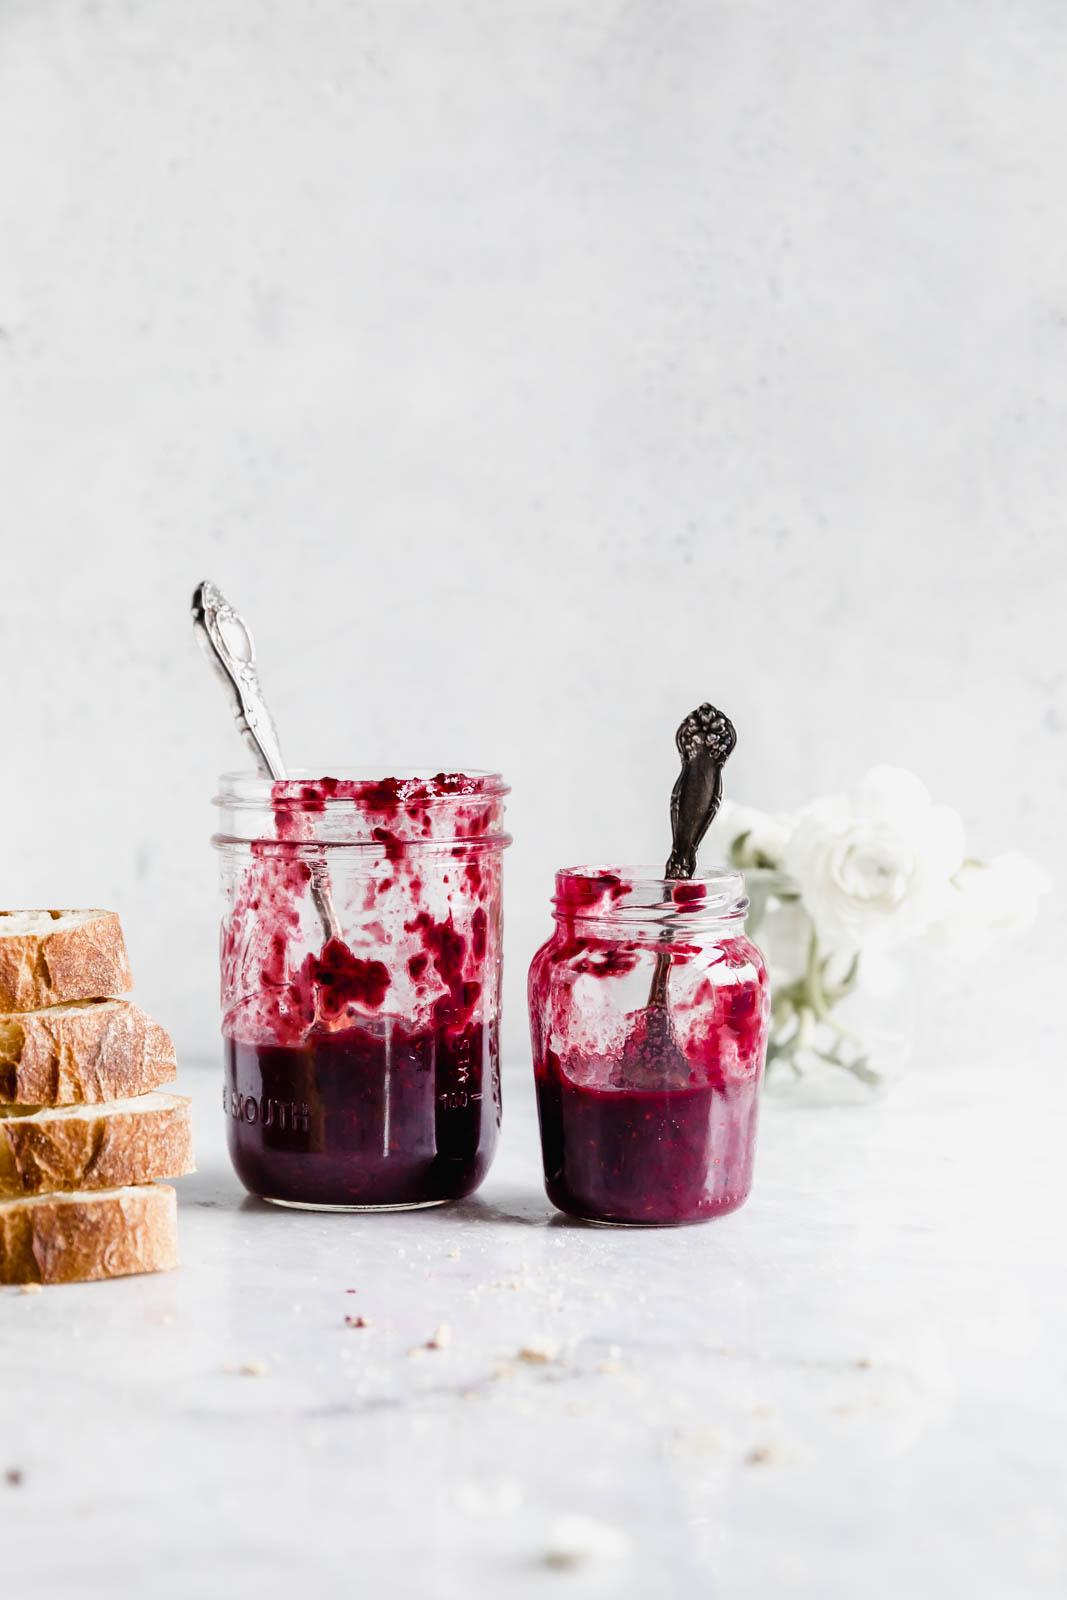 Bumbleberry-Chia-Jam-5.jpg